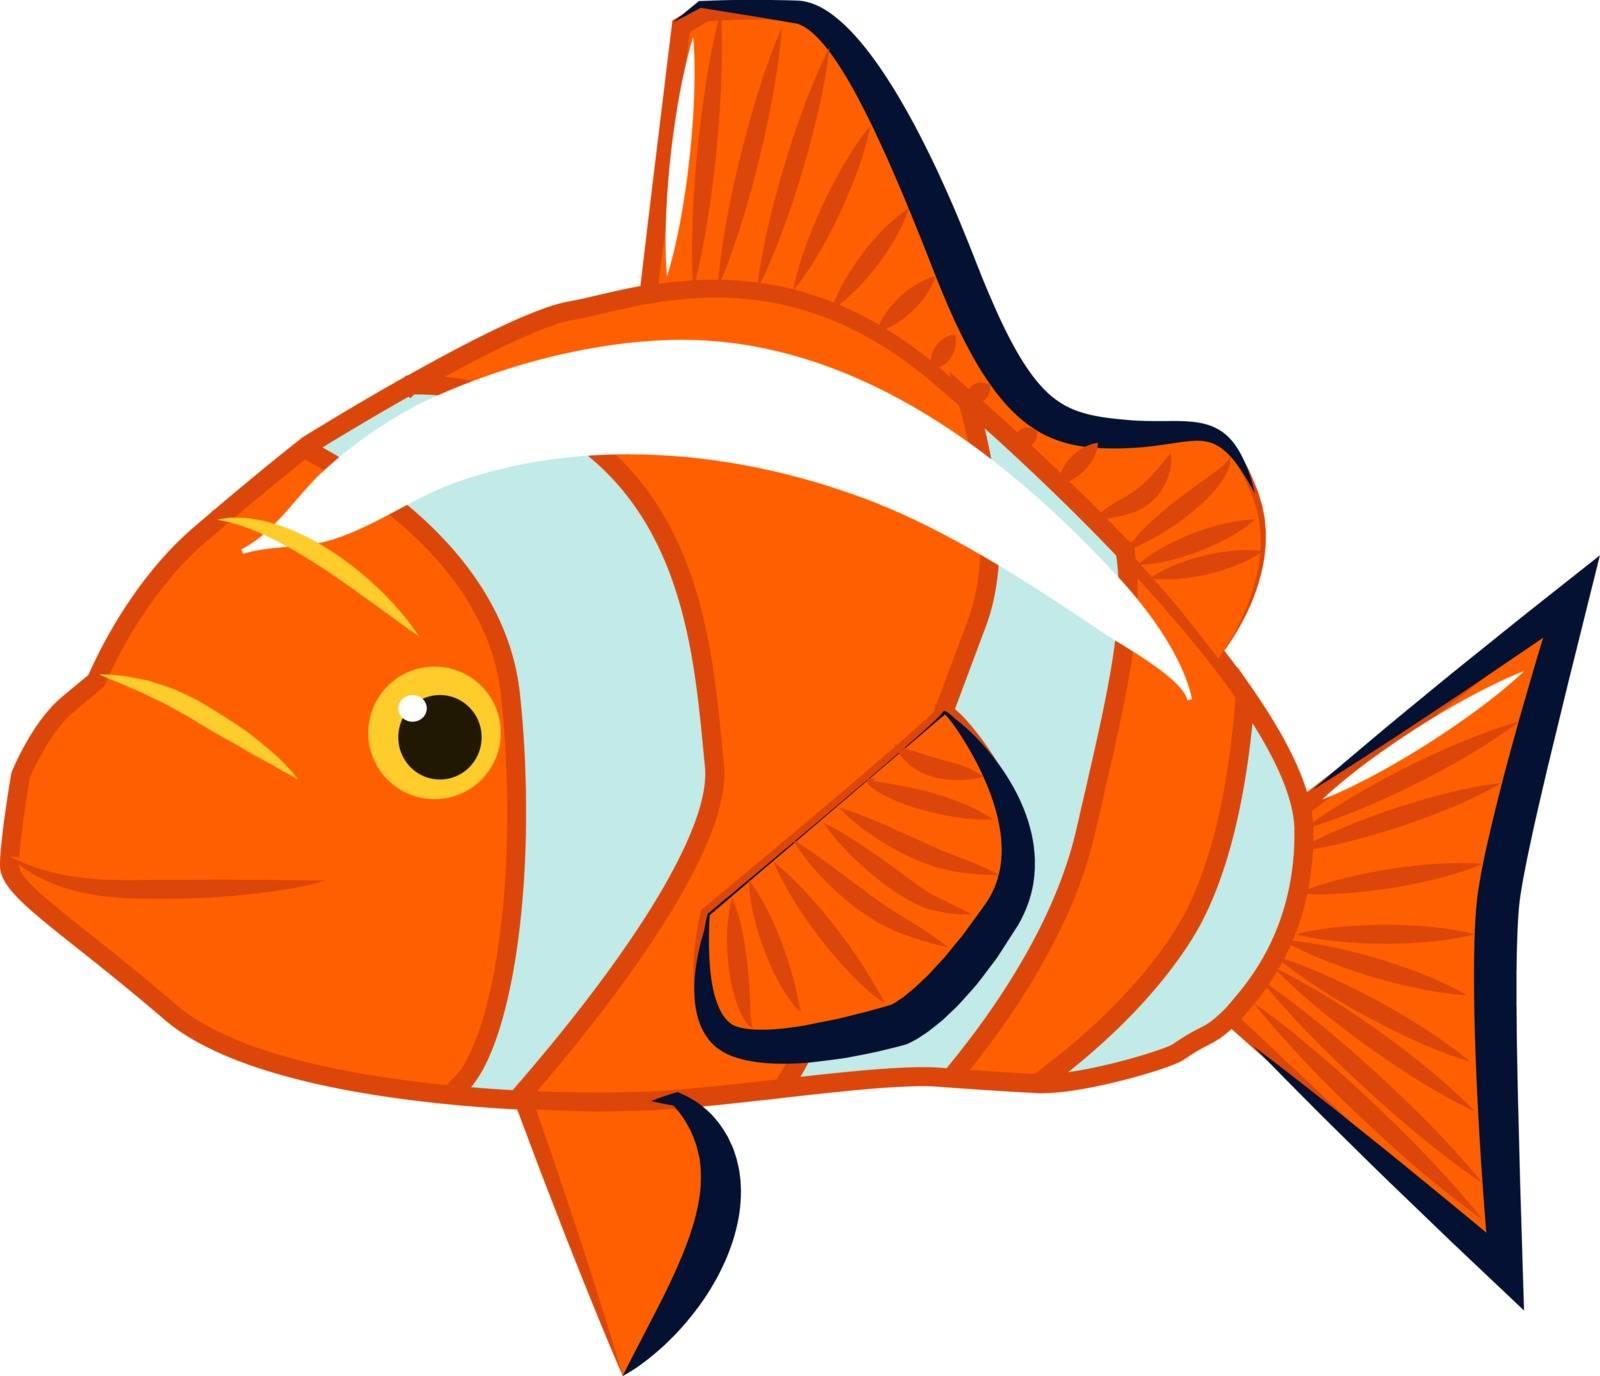 Orange fish, illustration, vector on white background.